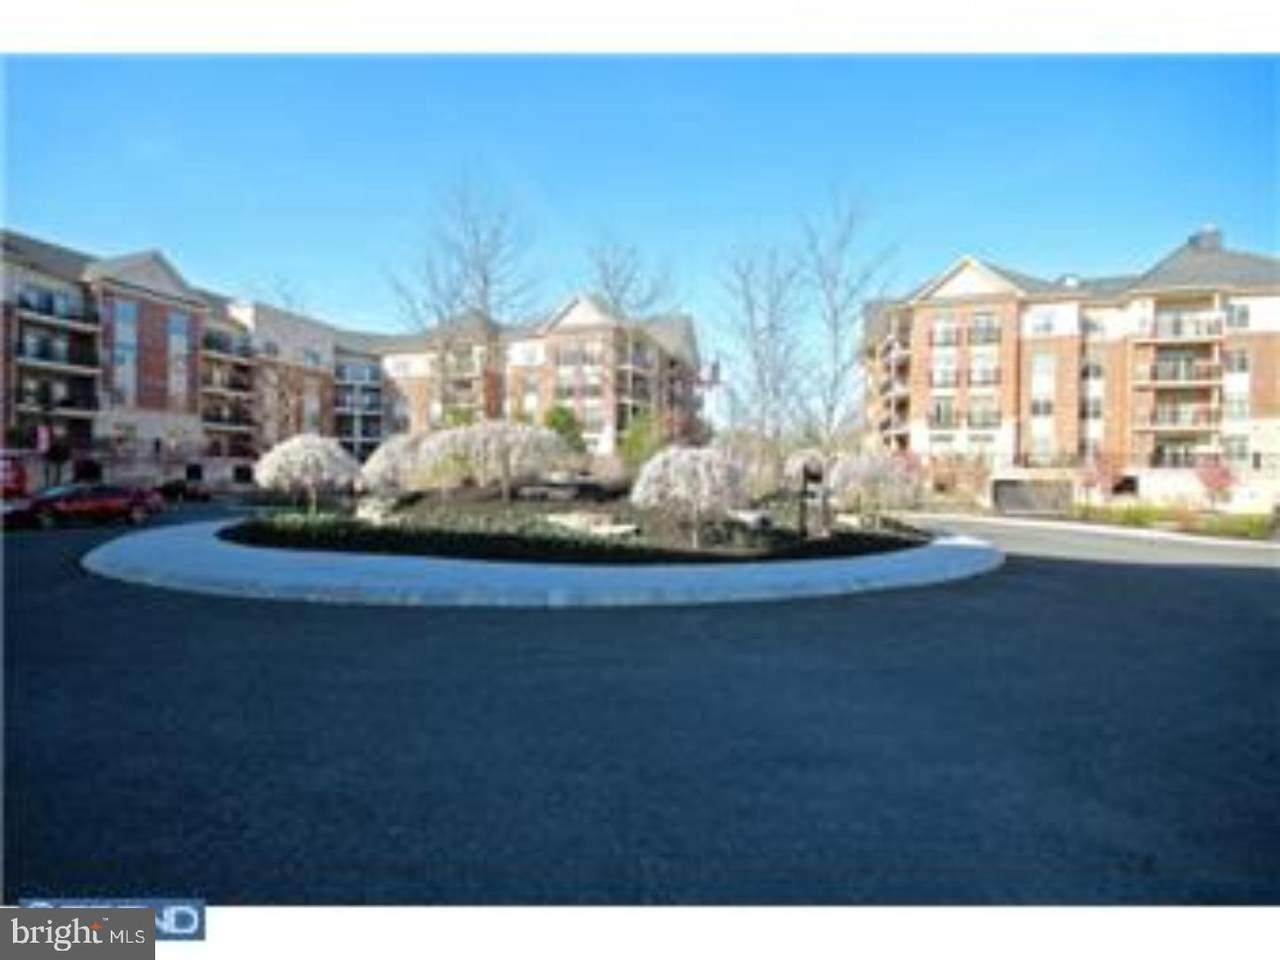 526 Carson Terrace - Photo 1